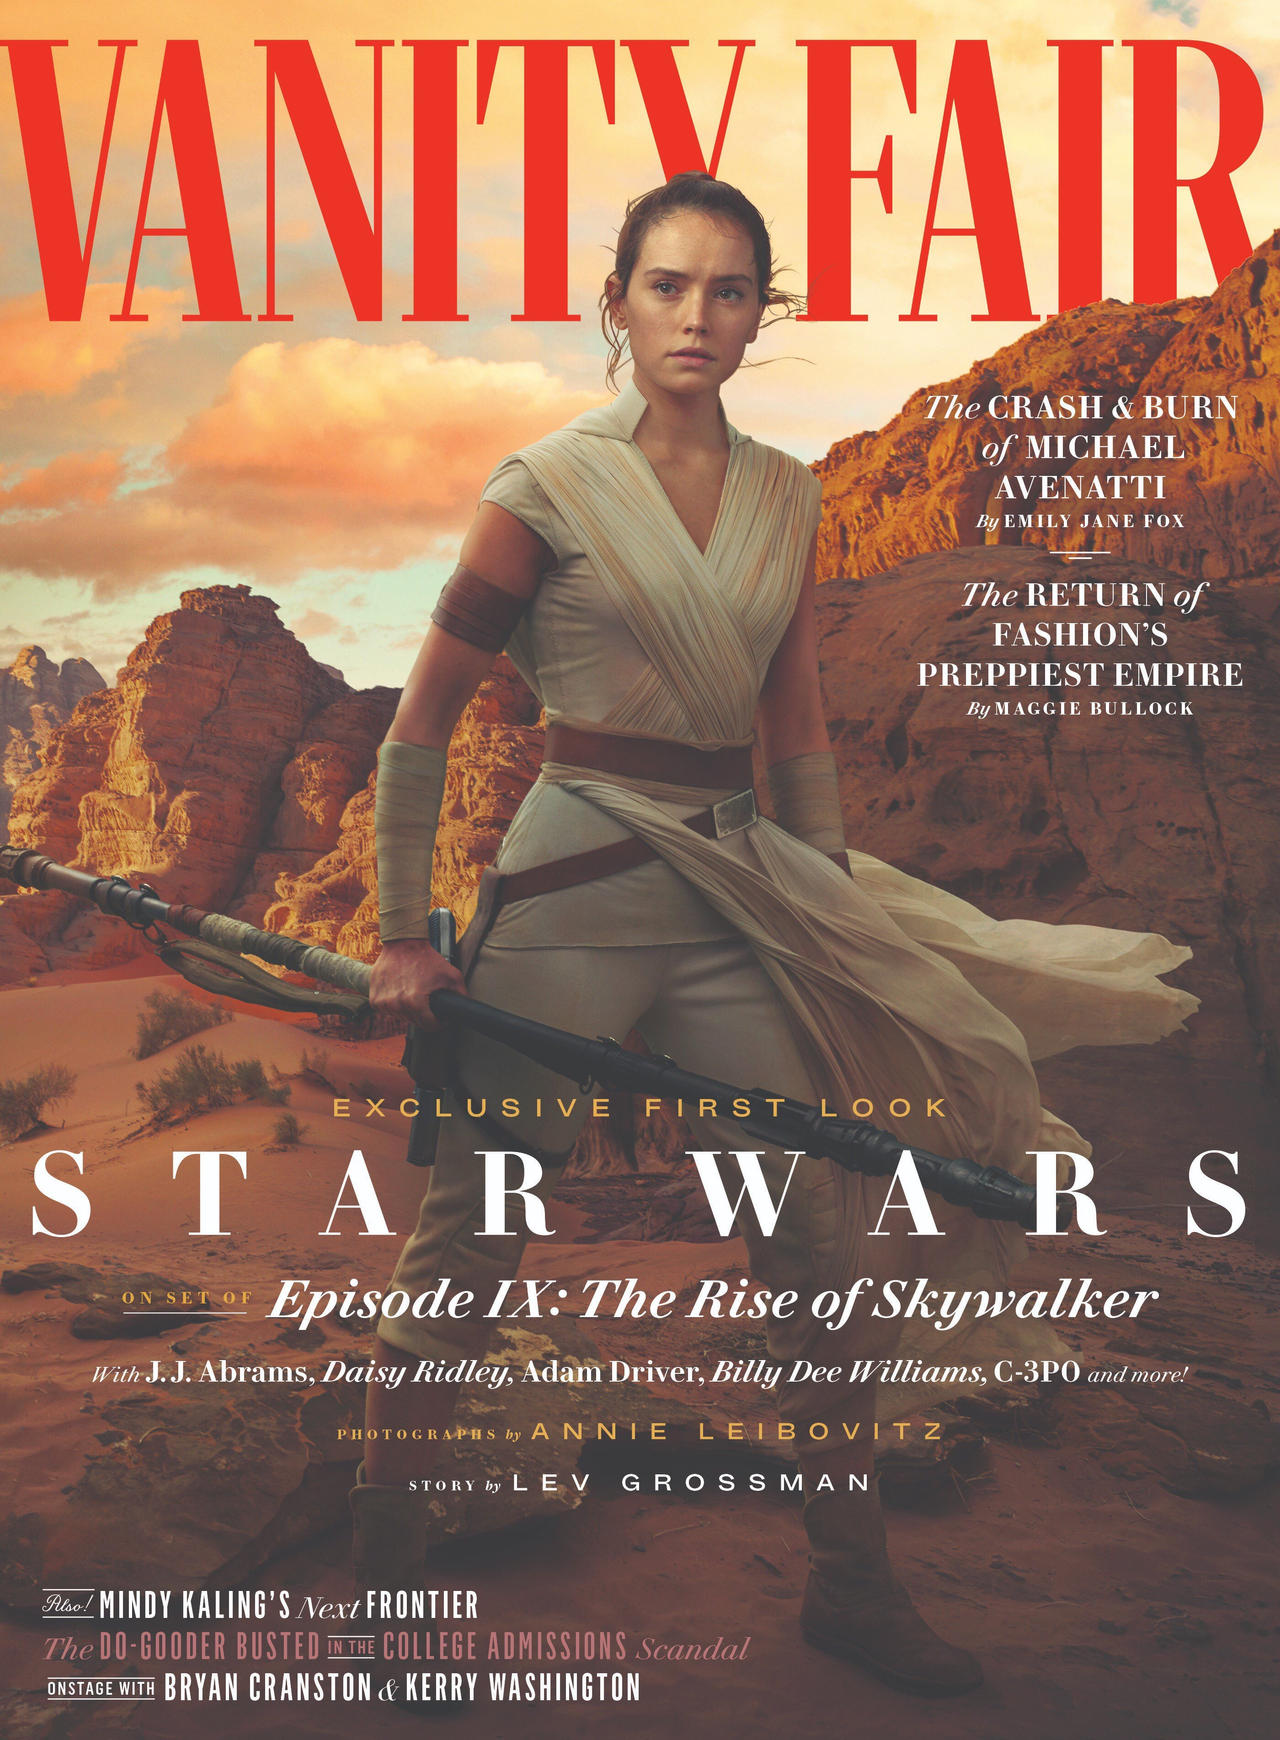 Star Wars The Rise Of Skywalker Rey Vf Cover By Artlover67 On Deviantart